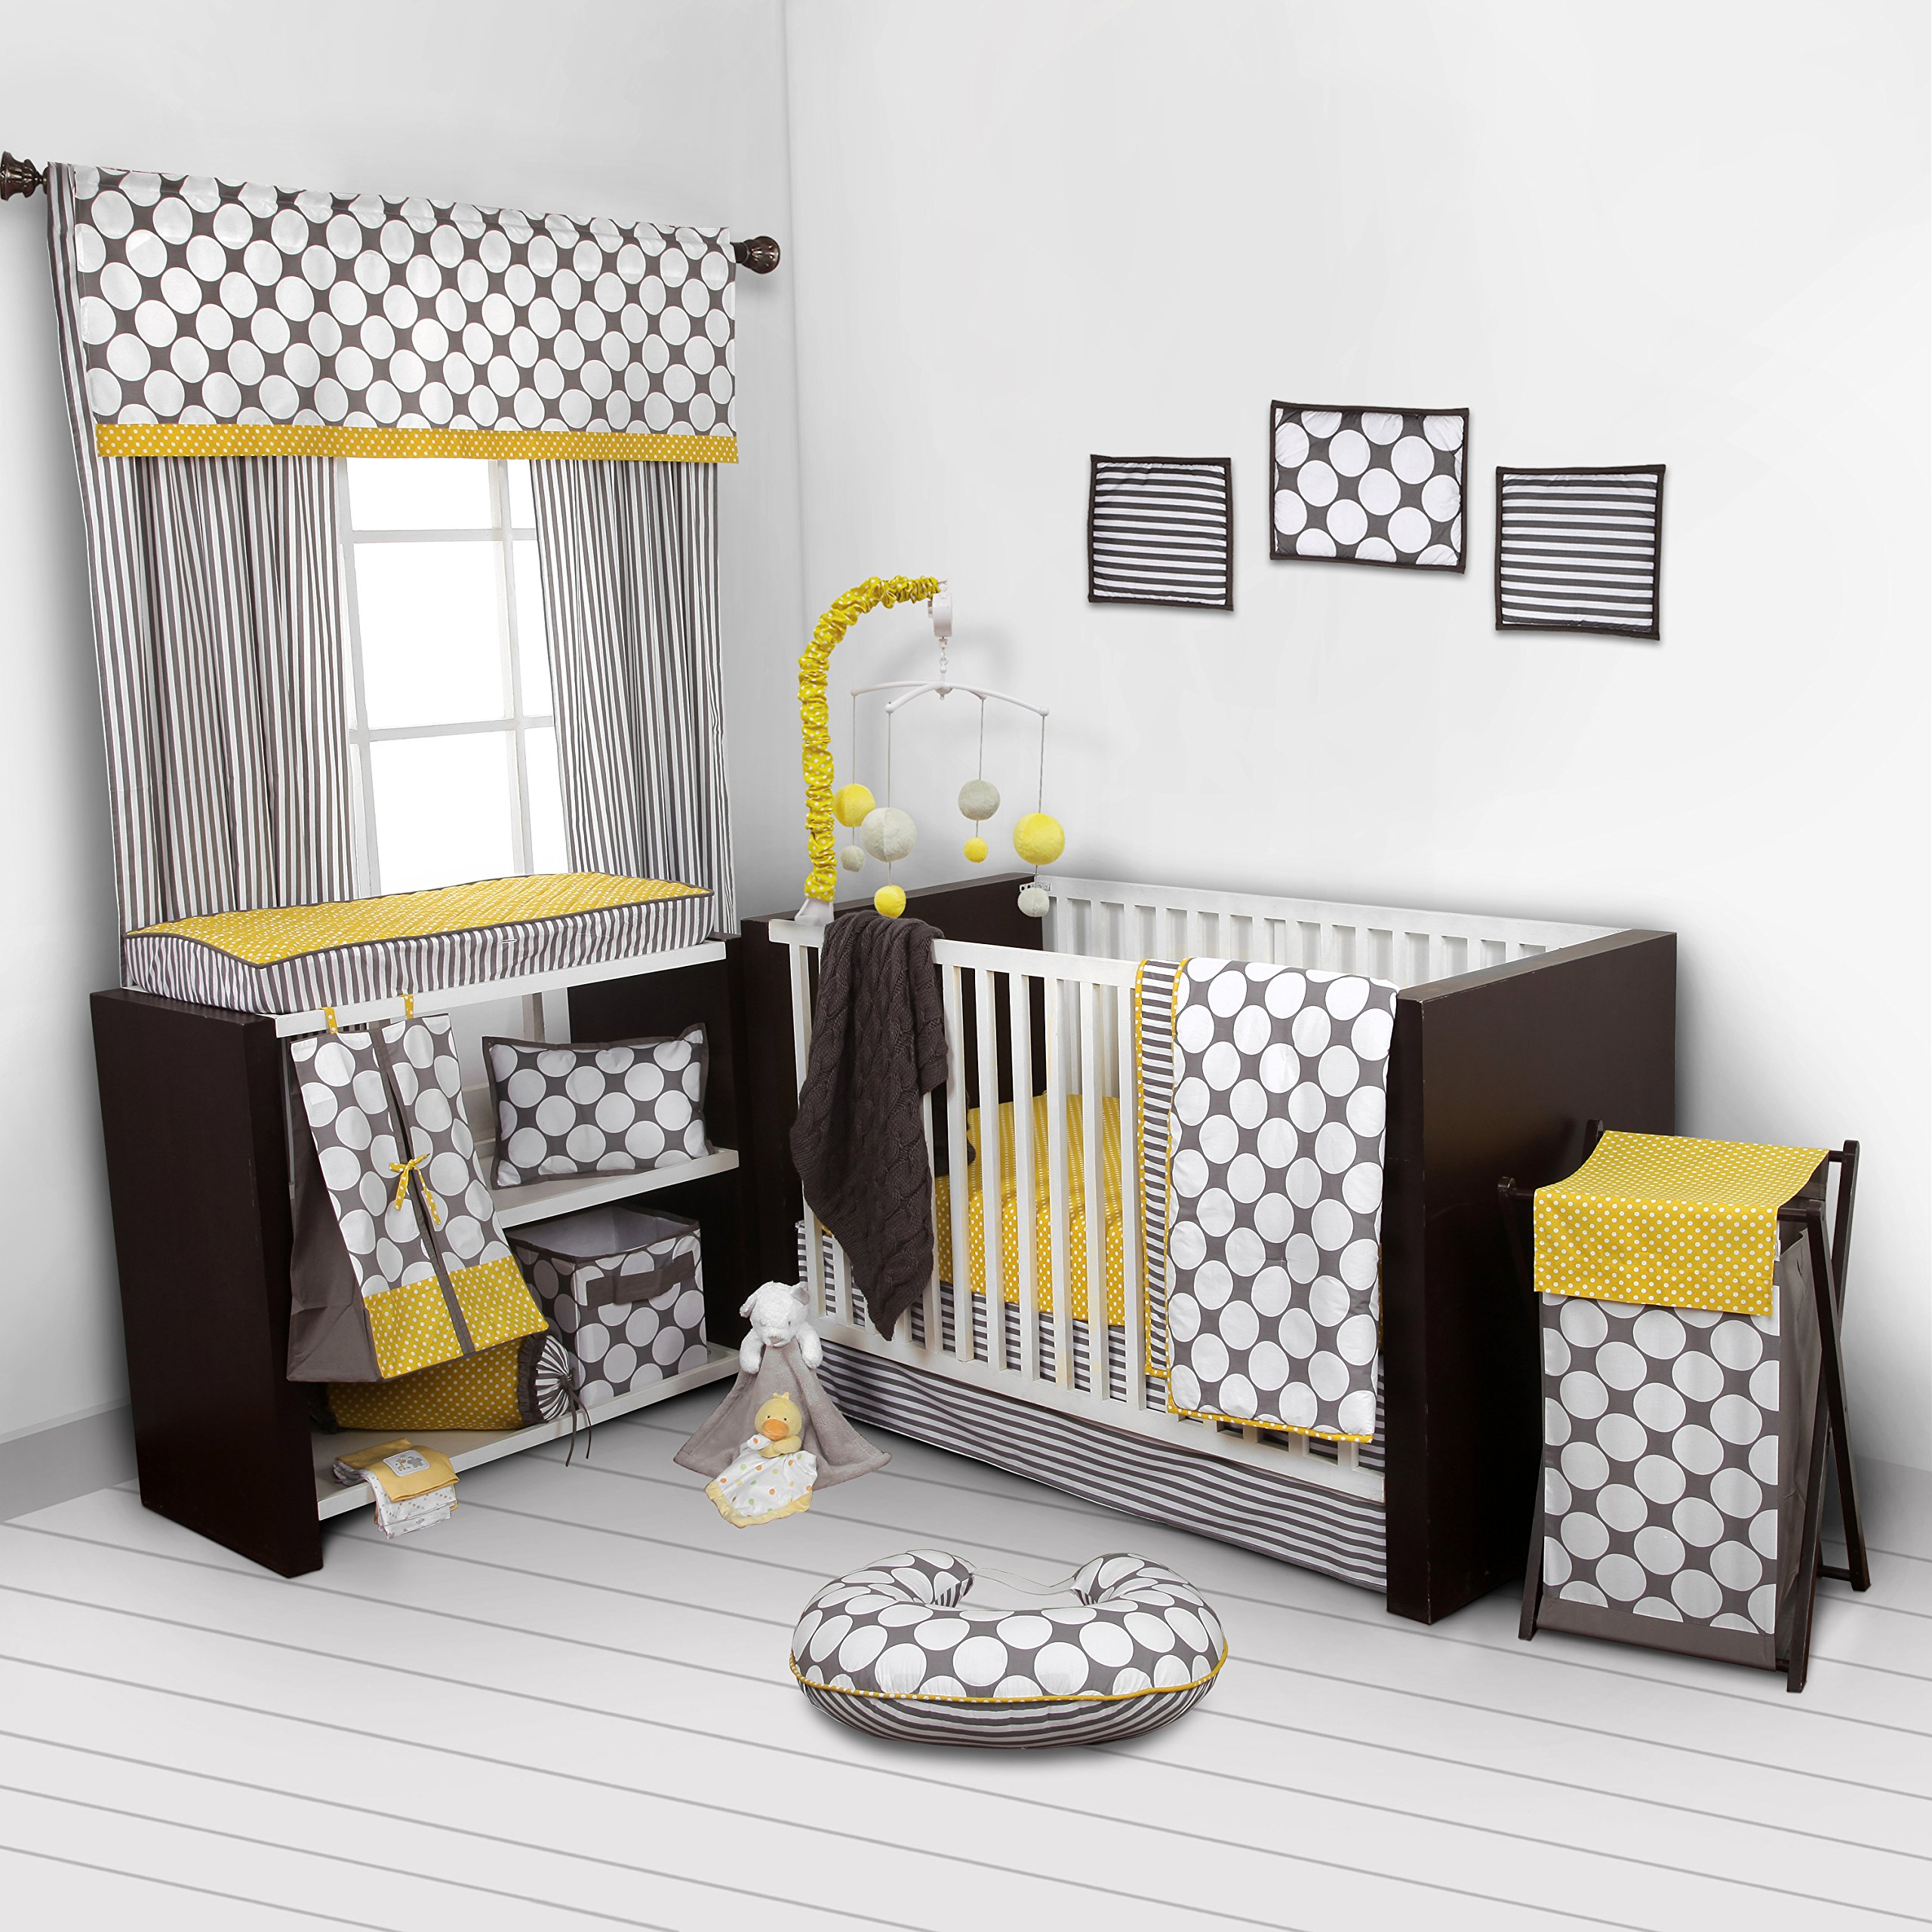 Bacati - Dots/pin Stripes Grey/yellow 10 Pc Crib Set Without Bumper Pad